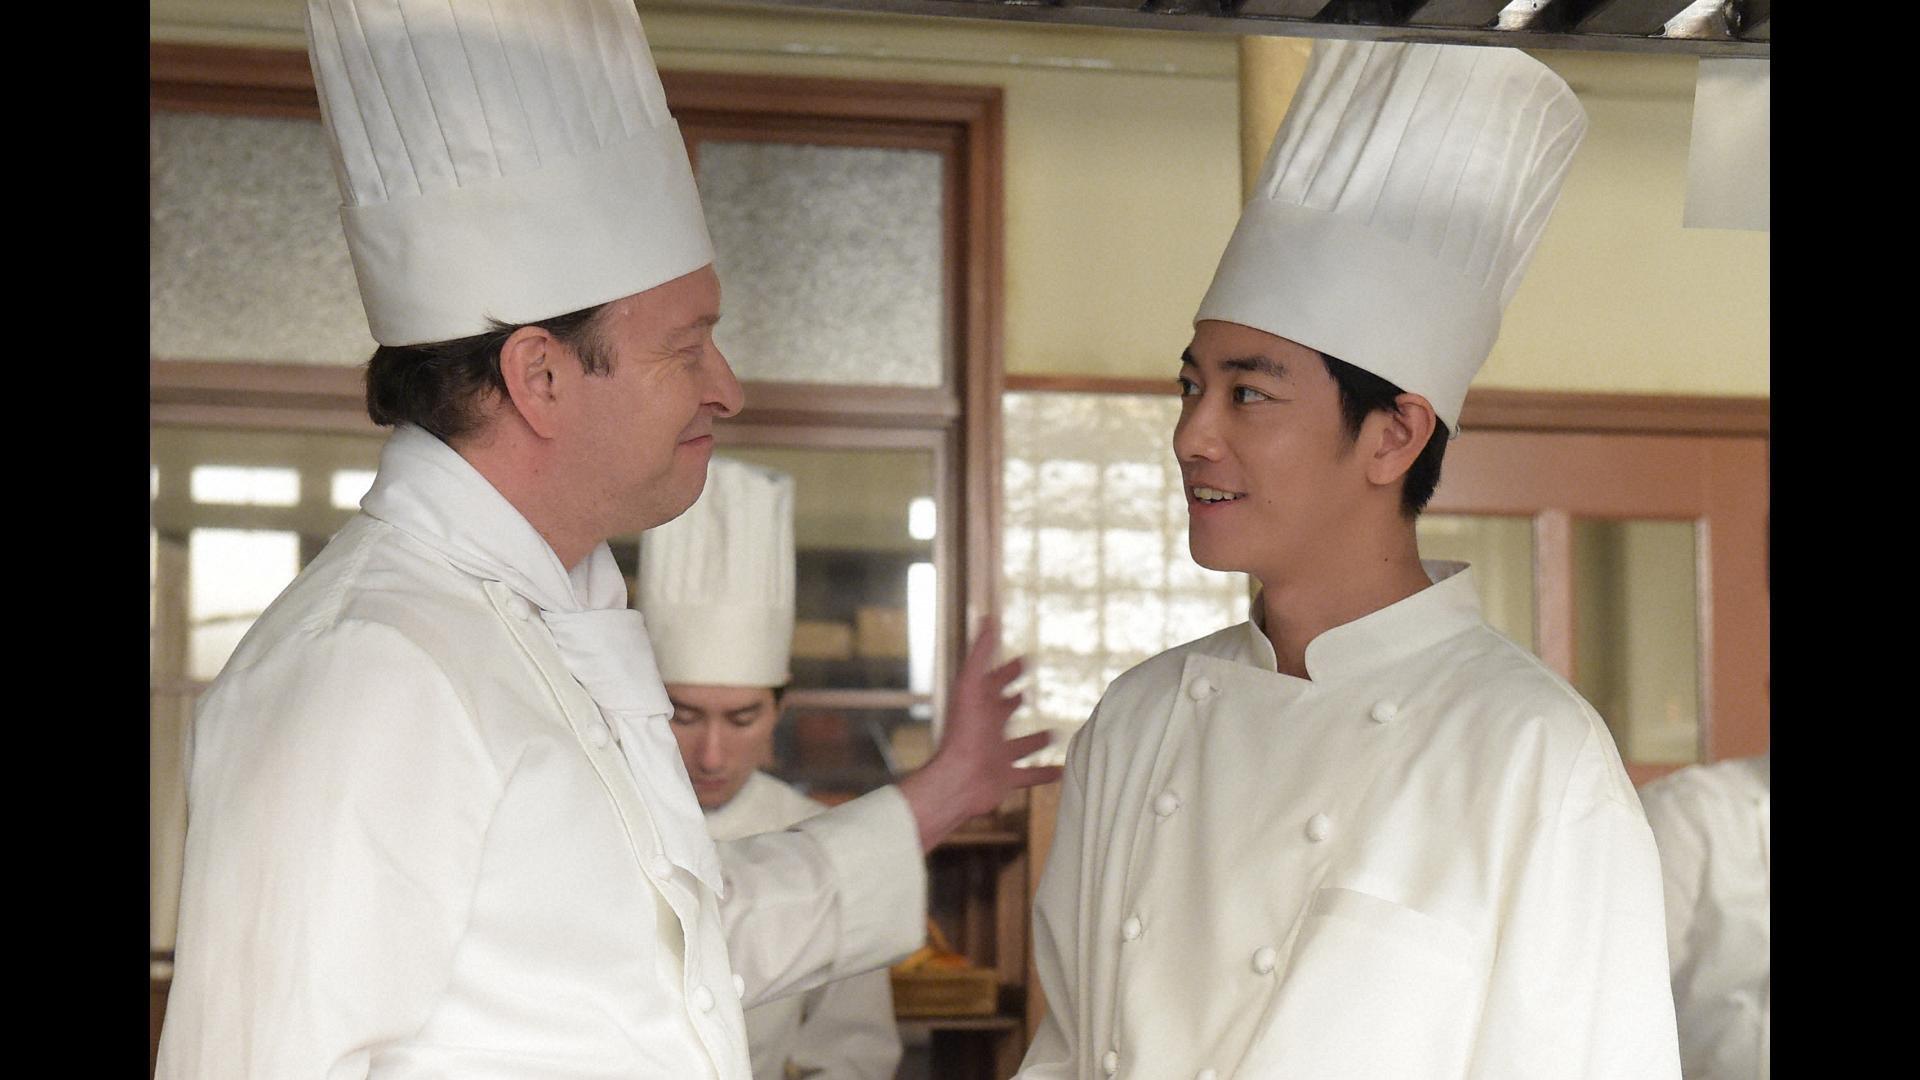 12606865 aa0ba529b9b0486483967a9433c35f19 l - 天皇の料理人を務めた主人公のストーリー『天皇の料理番』のあらすじ